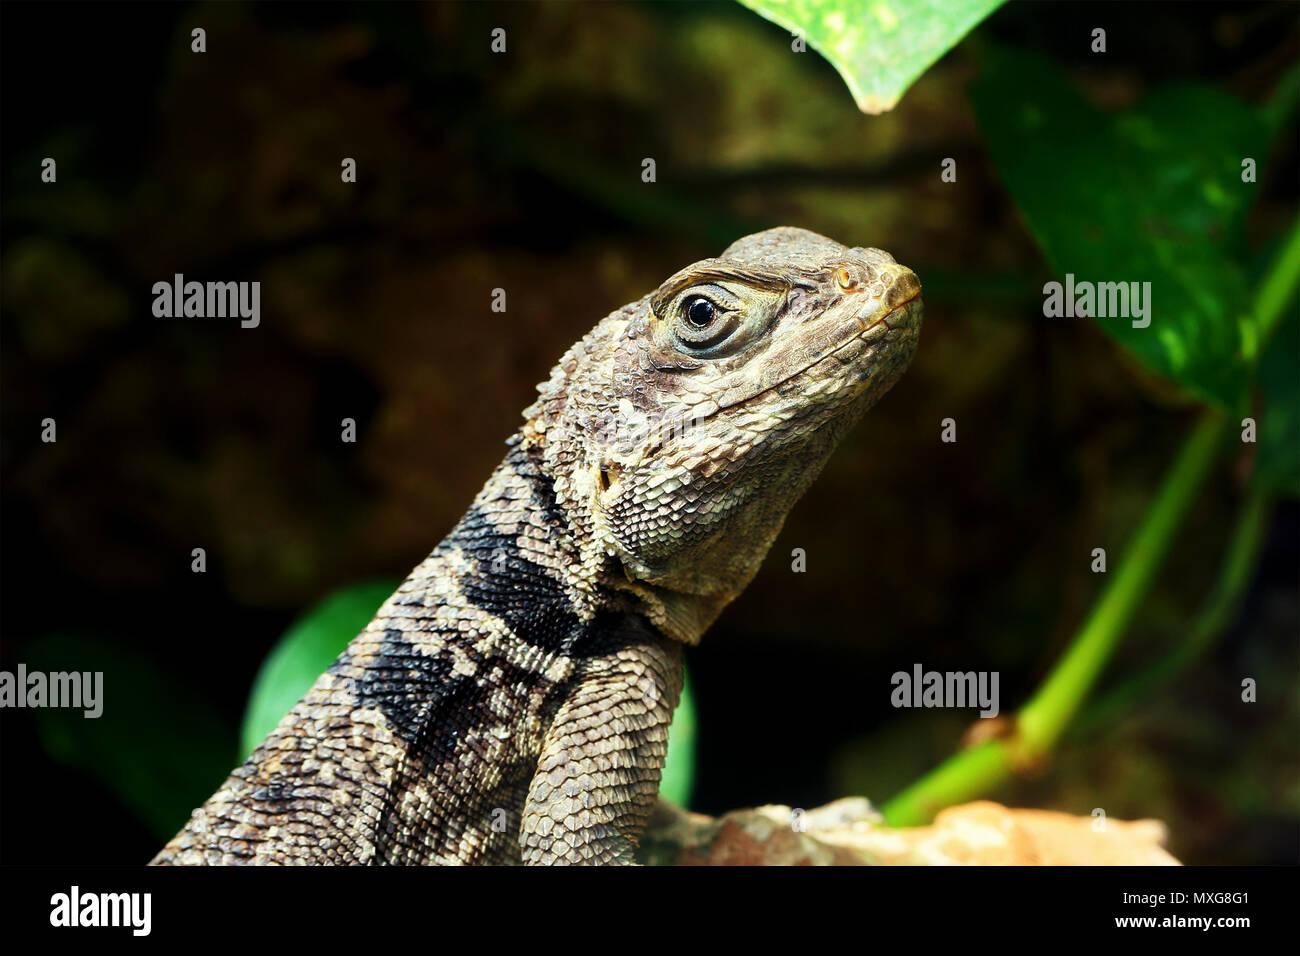 Green Small Lizard Gecko Close Up Macro In Terrarium Stock Photo